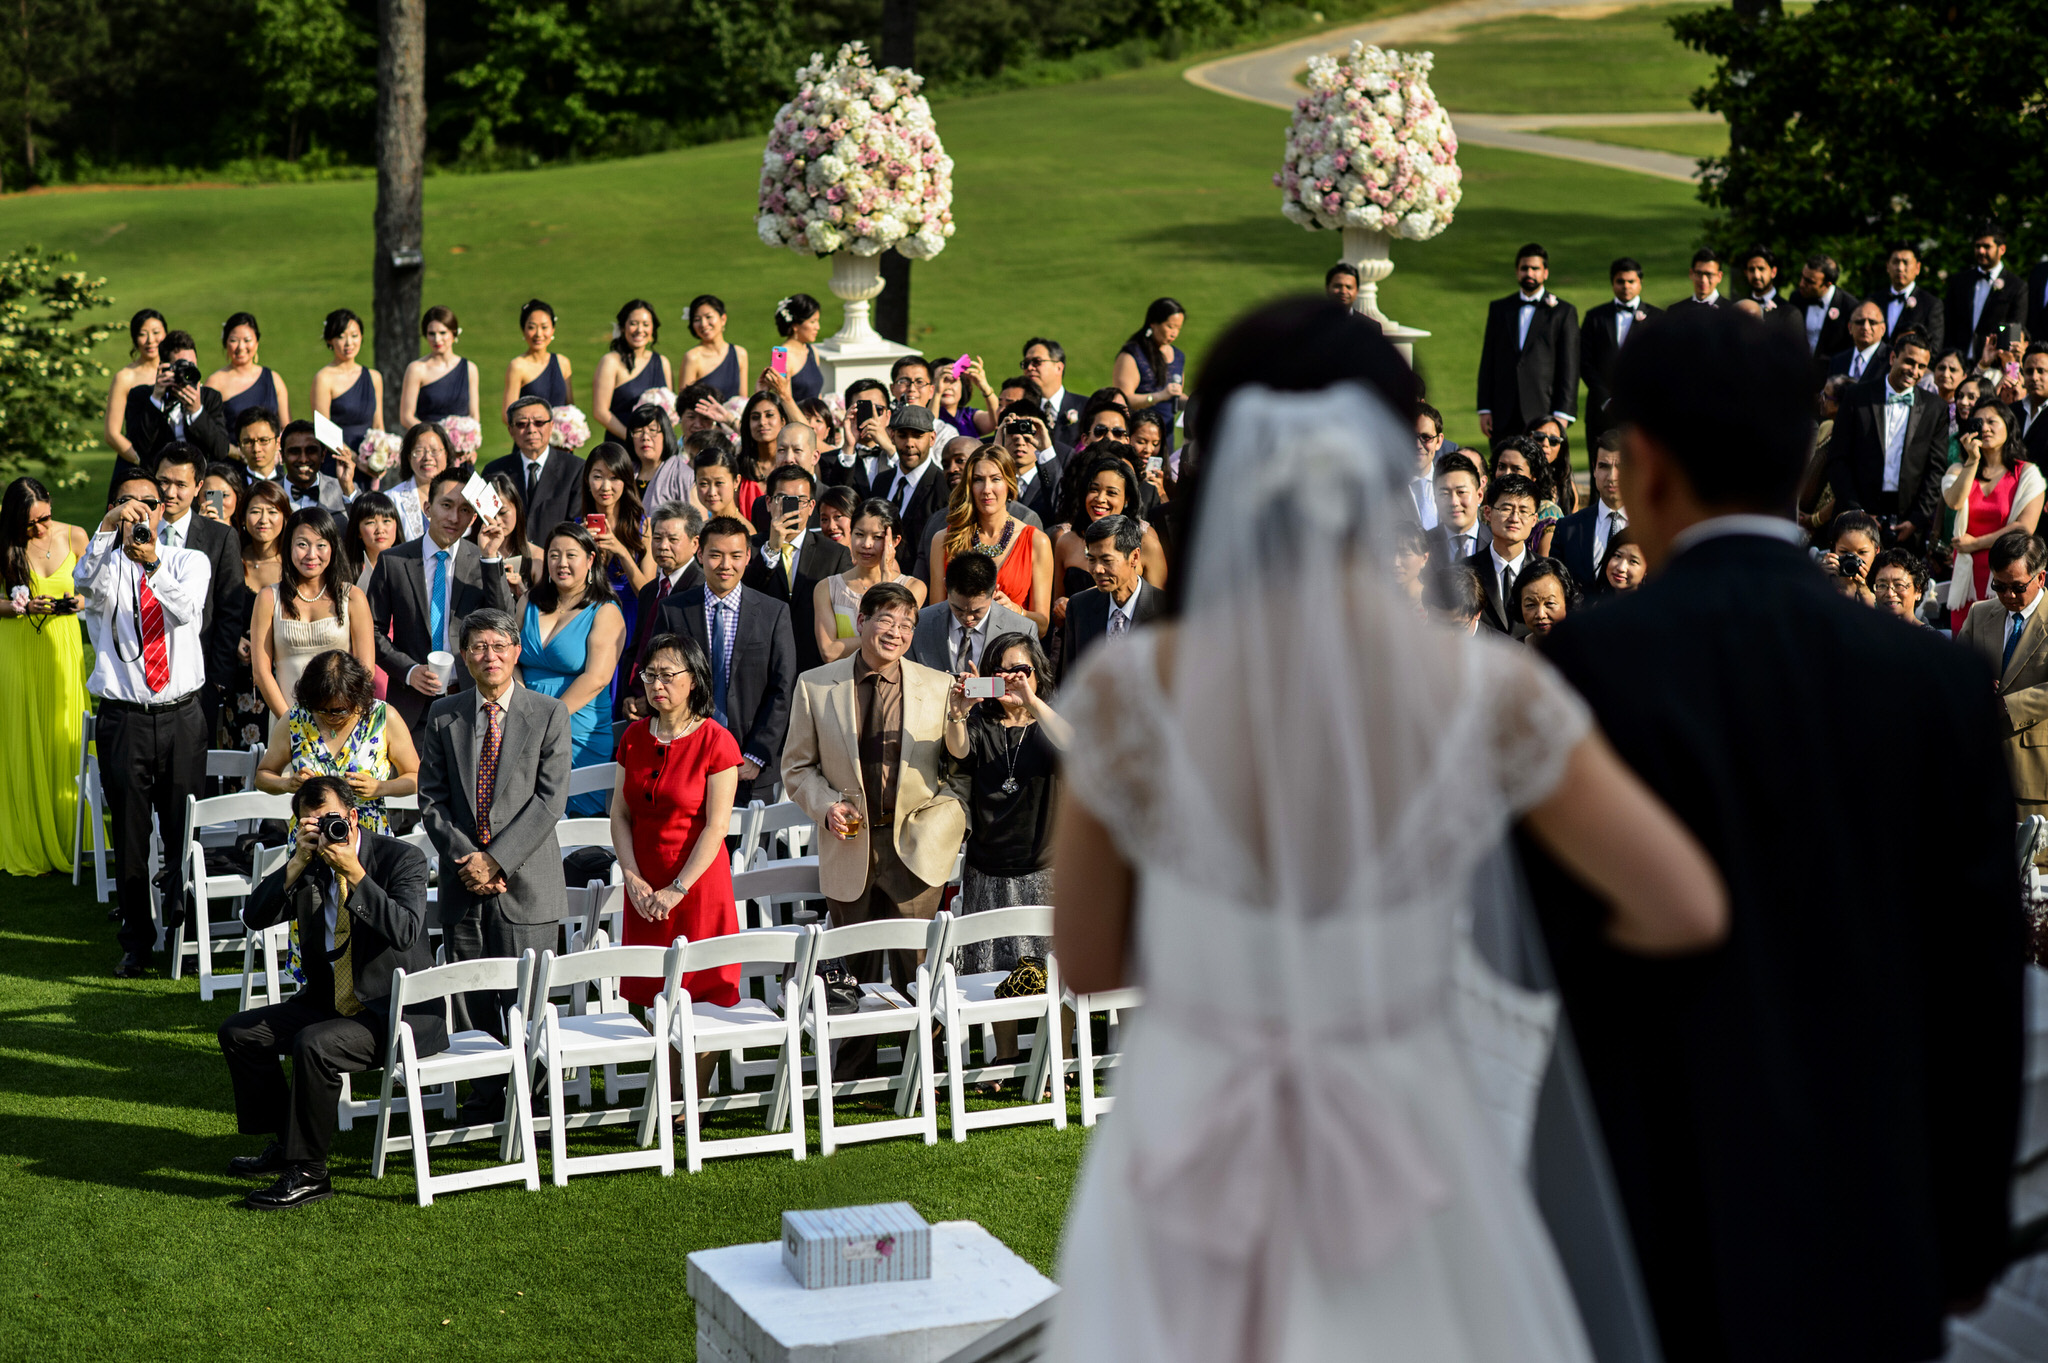 Lulu and Rahul Khara's wedding at Sugarloaf Country Club in Duluth, GA.